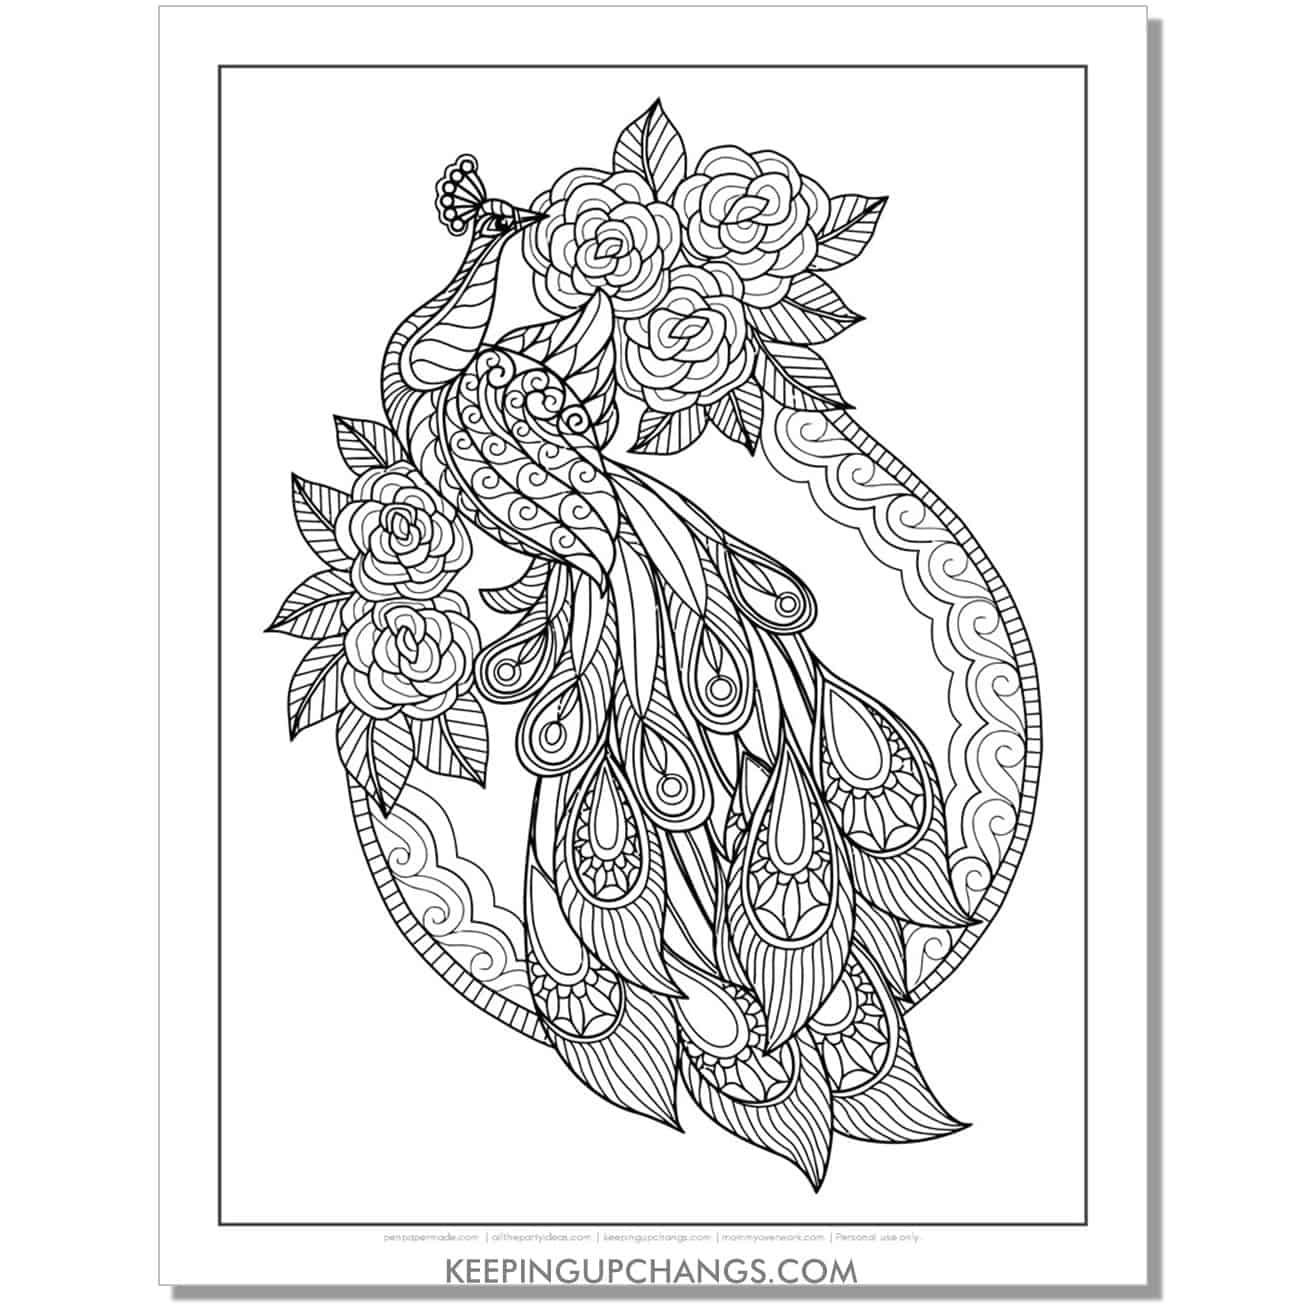 rose princess peacock coloring page.